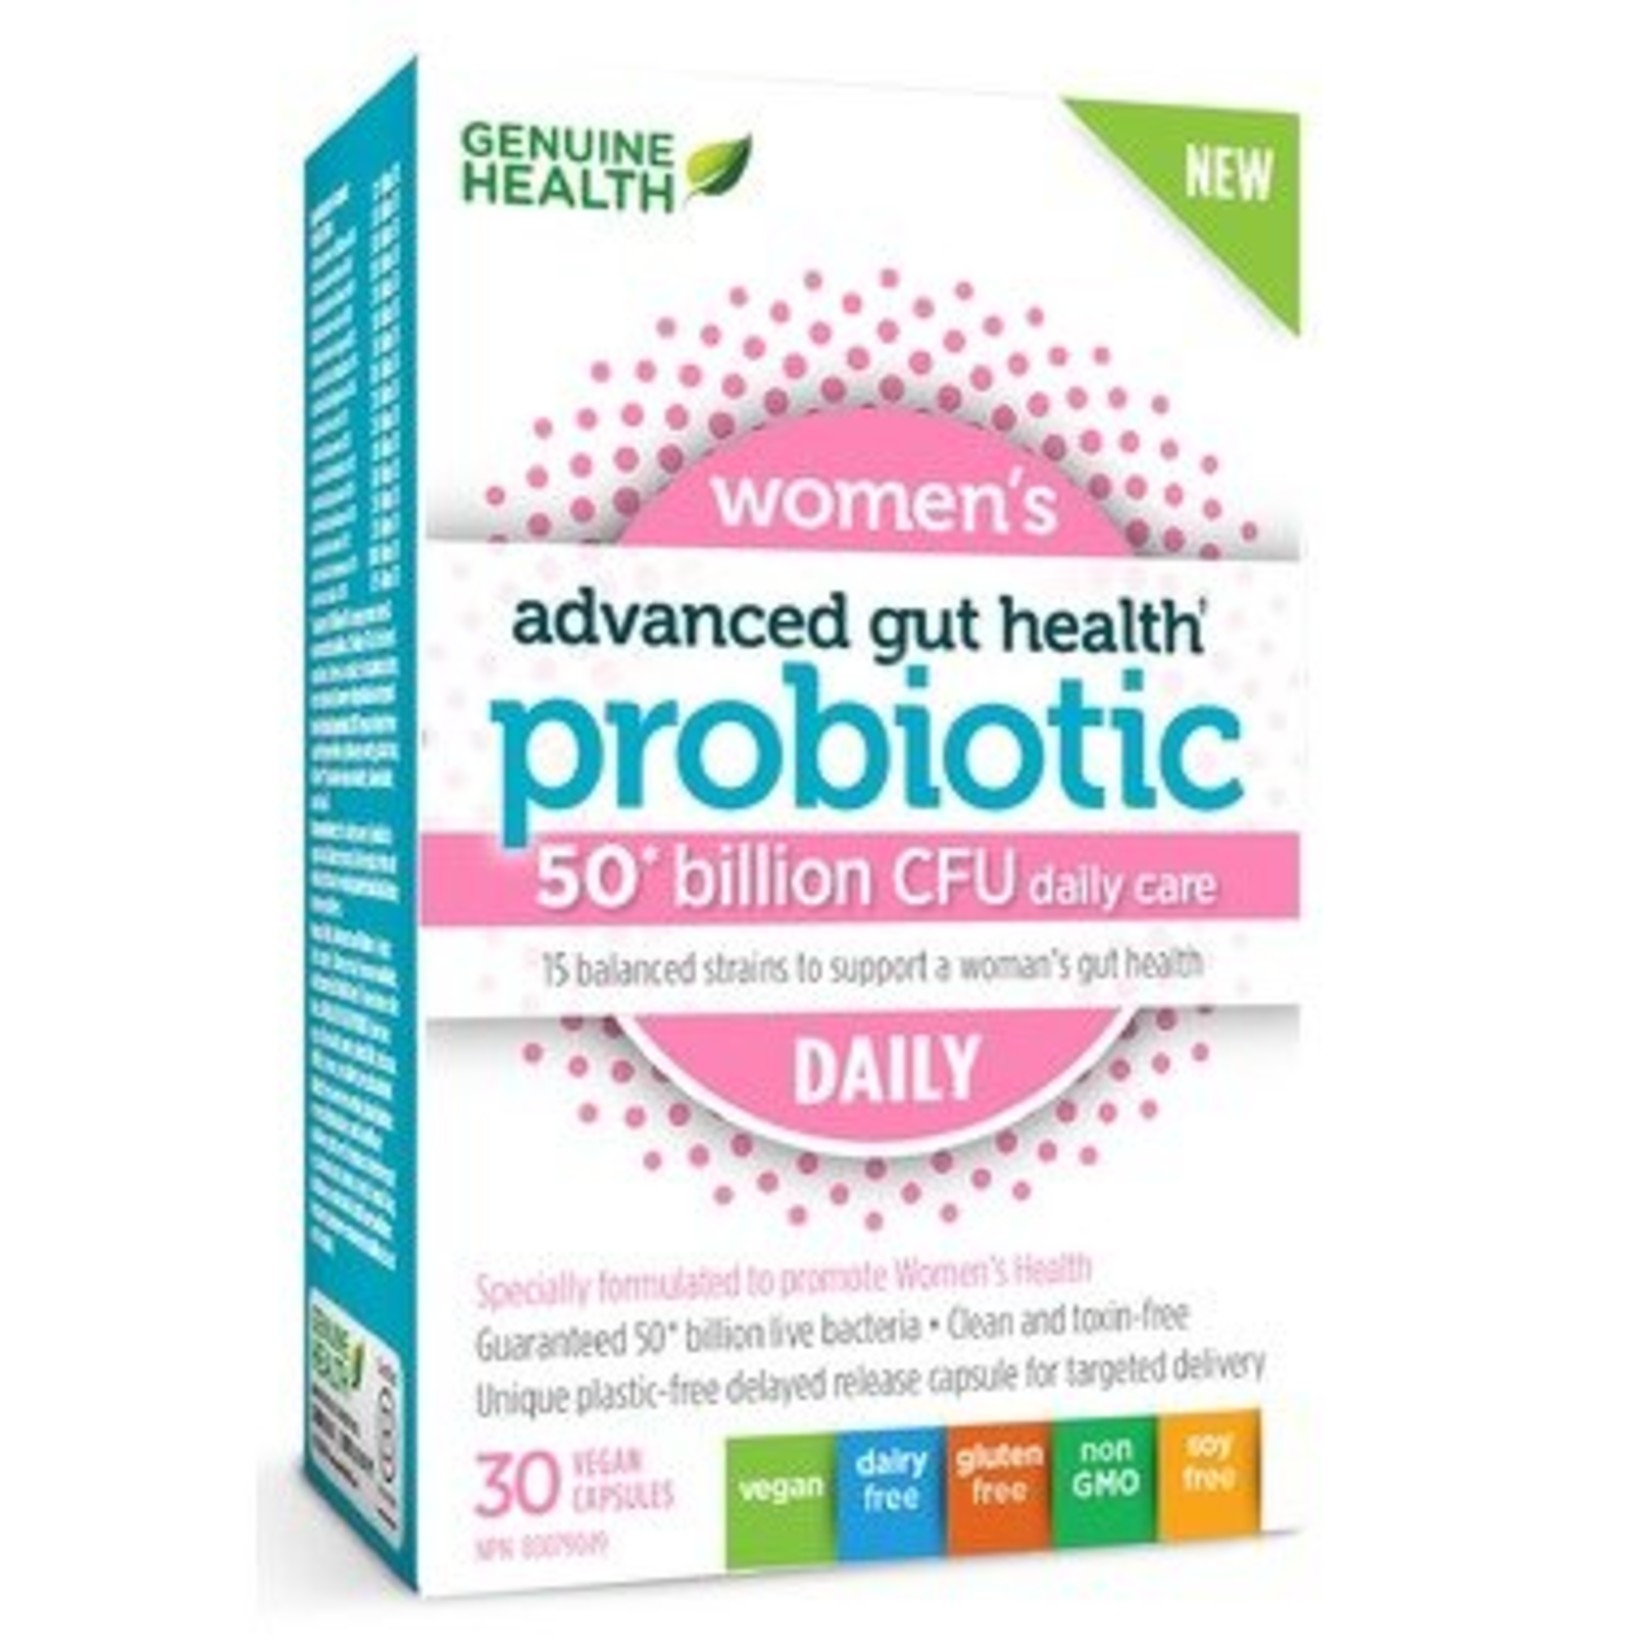 Genuine Health Genuine Health Advanced Gut Health - Probiotic Womens Daily 30 caps